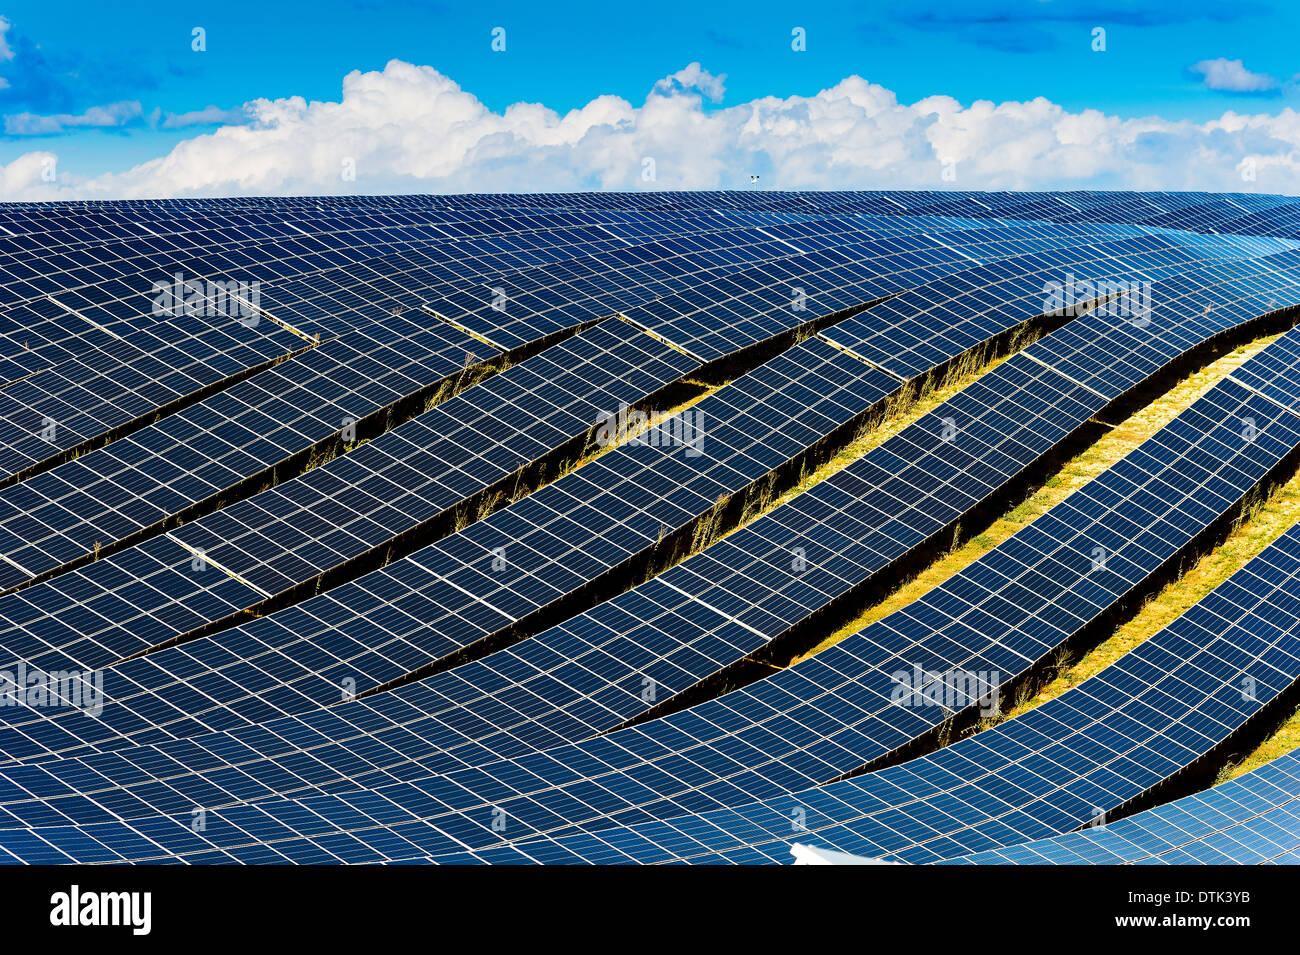 Europe, France, Alpes de Haute Provence region Puimichel, the Mees Solar Farm, solar panels. - Stock Image